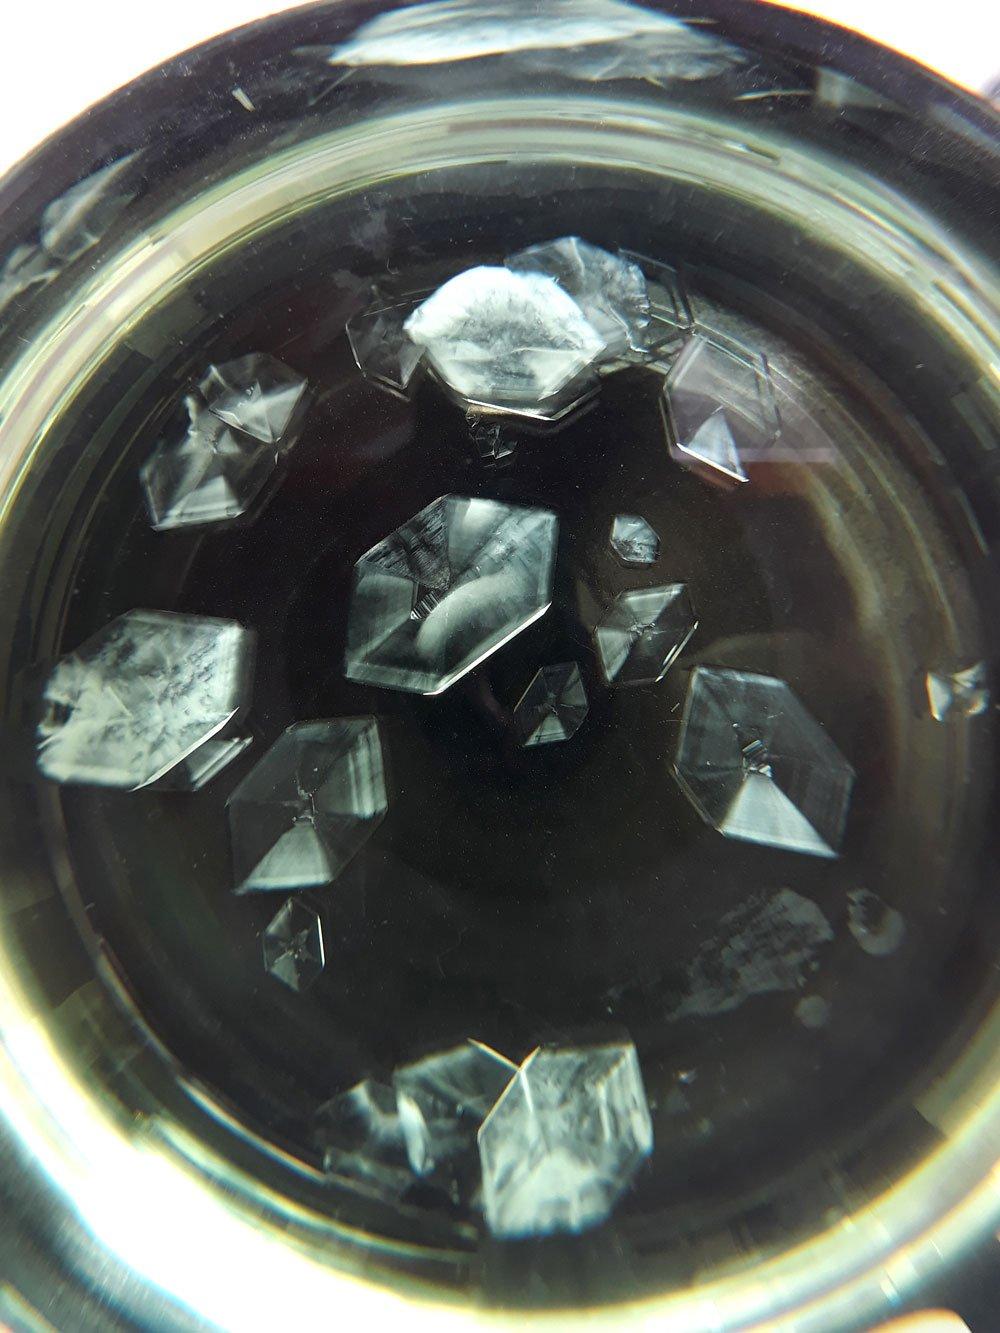 Mohr's salt crystals ready for harvesting.